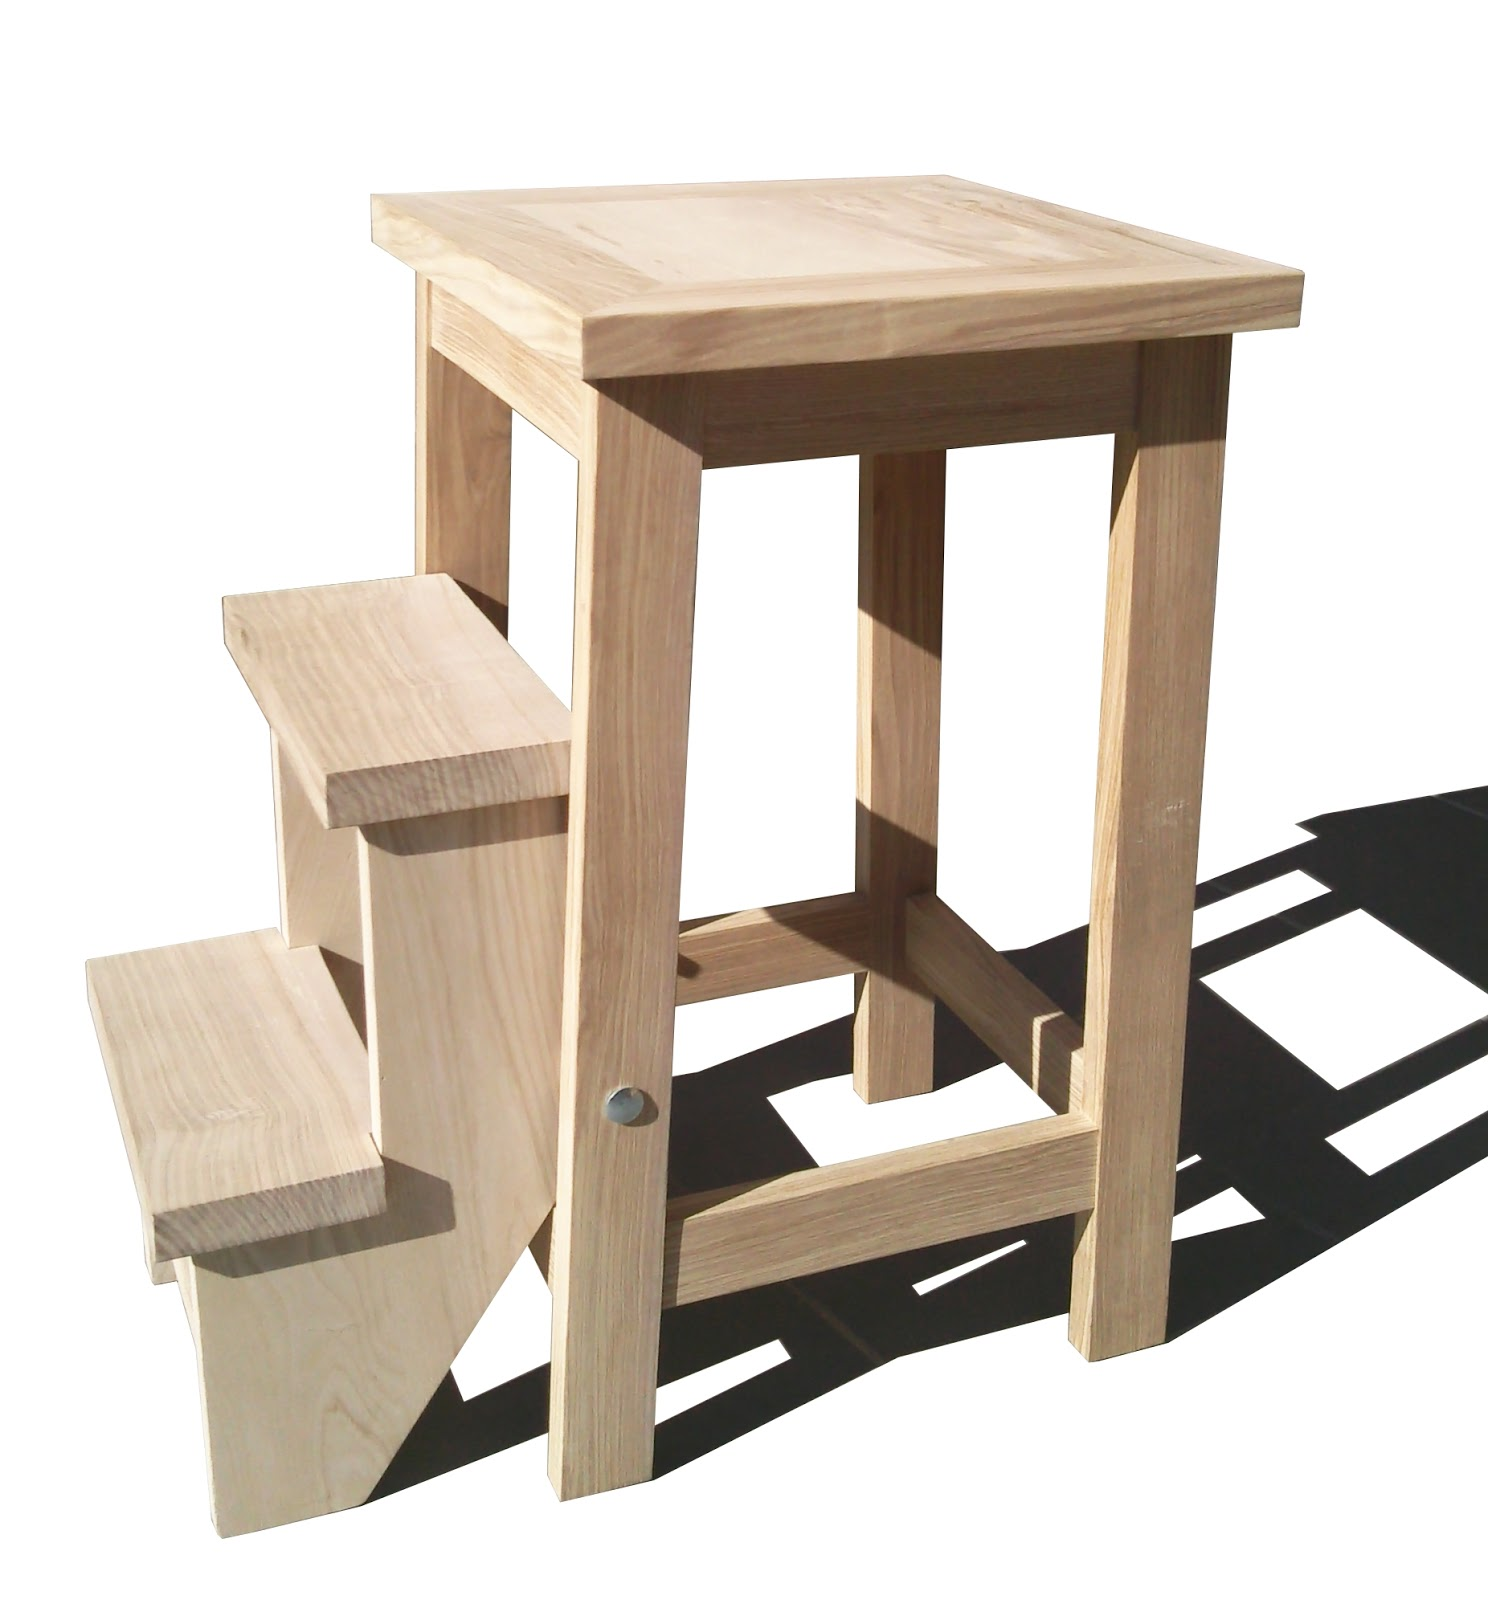 atelier de menuiserie tabourets tables. Black Bedroom Furniture Sets. Home Design Ideas